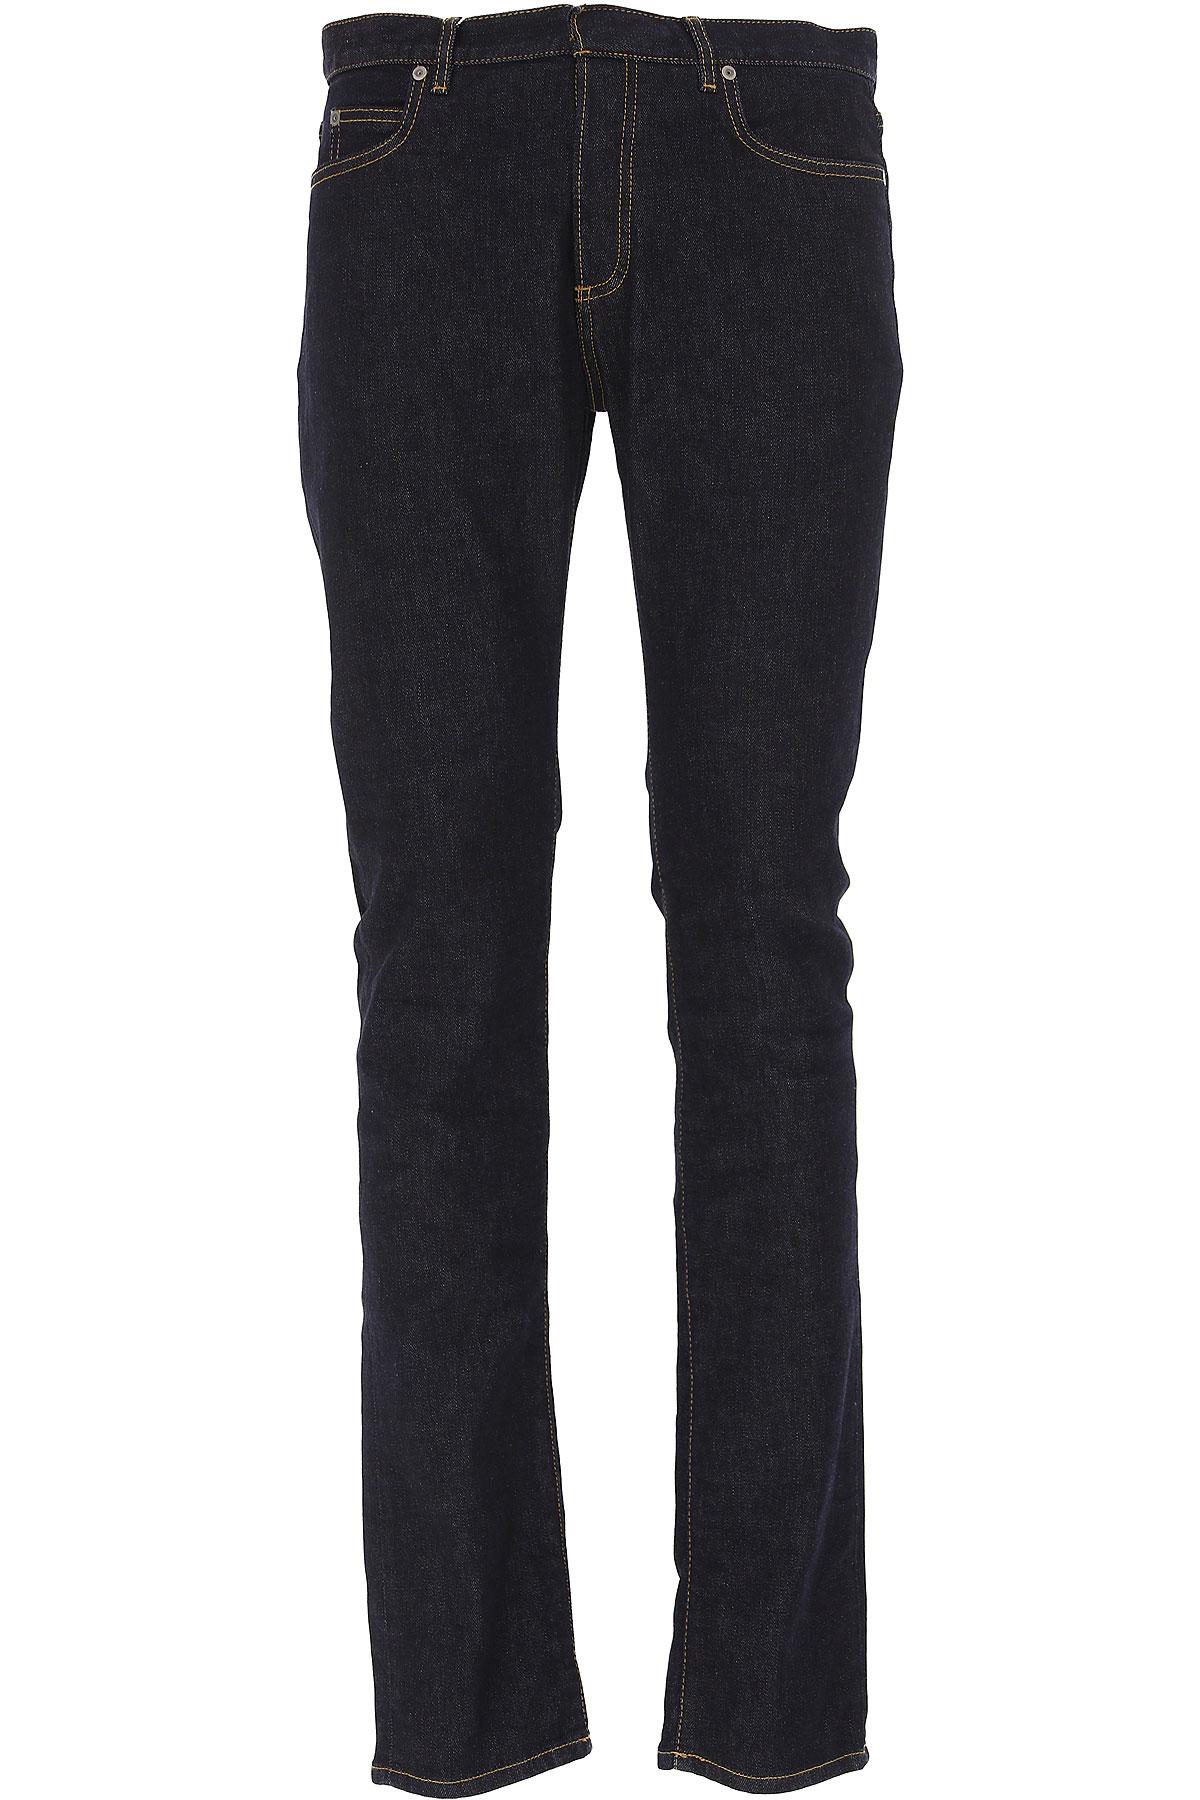 Maison Martin Margiela Jeans On Sale, Dark Blue Denim, Cotton, 2017, 30 32 33 34 USA-428020